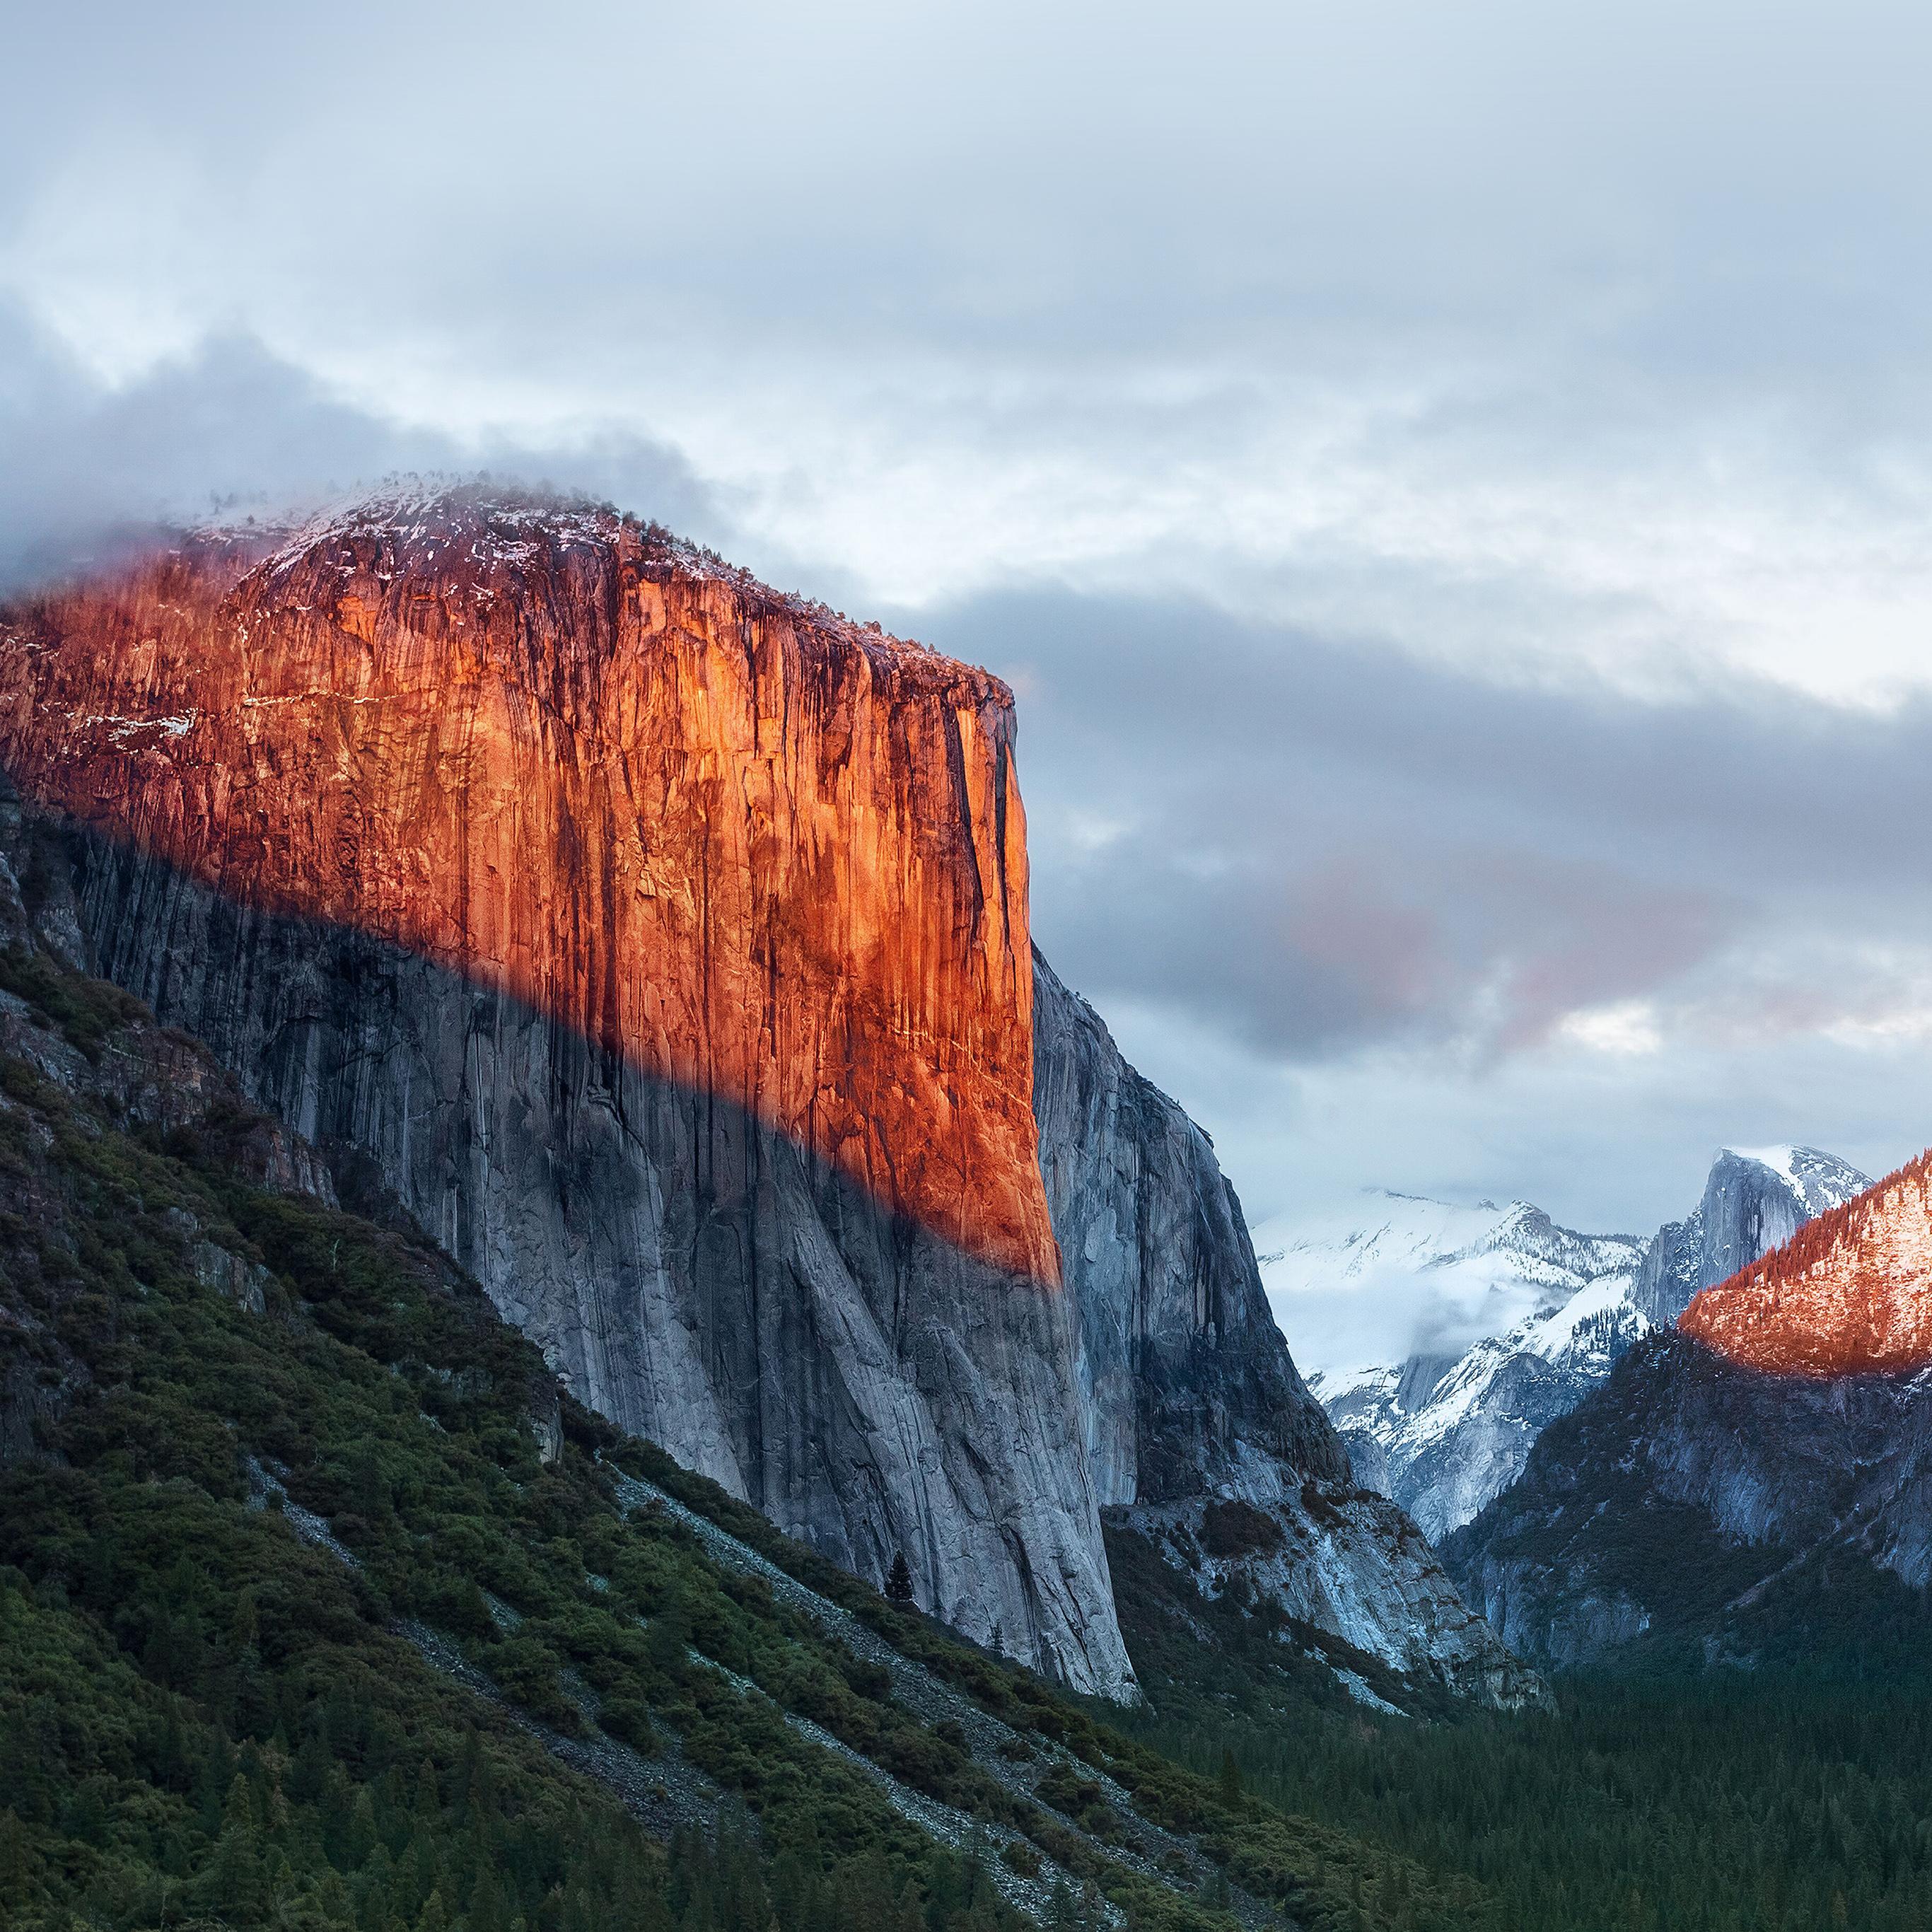 Am86-apple-el-capitan-osx-mac-mountain-wwdc-nature